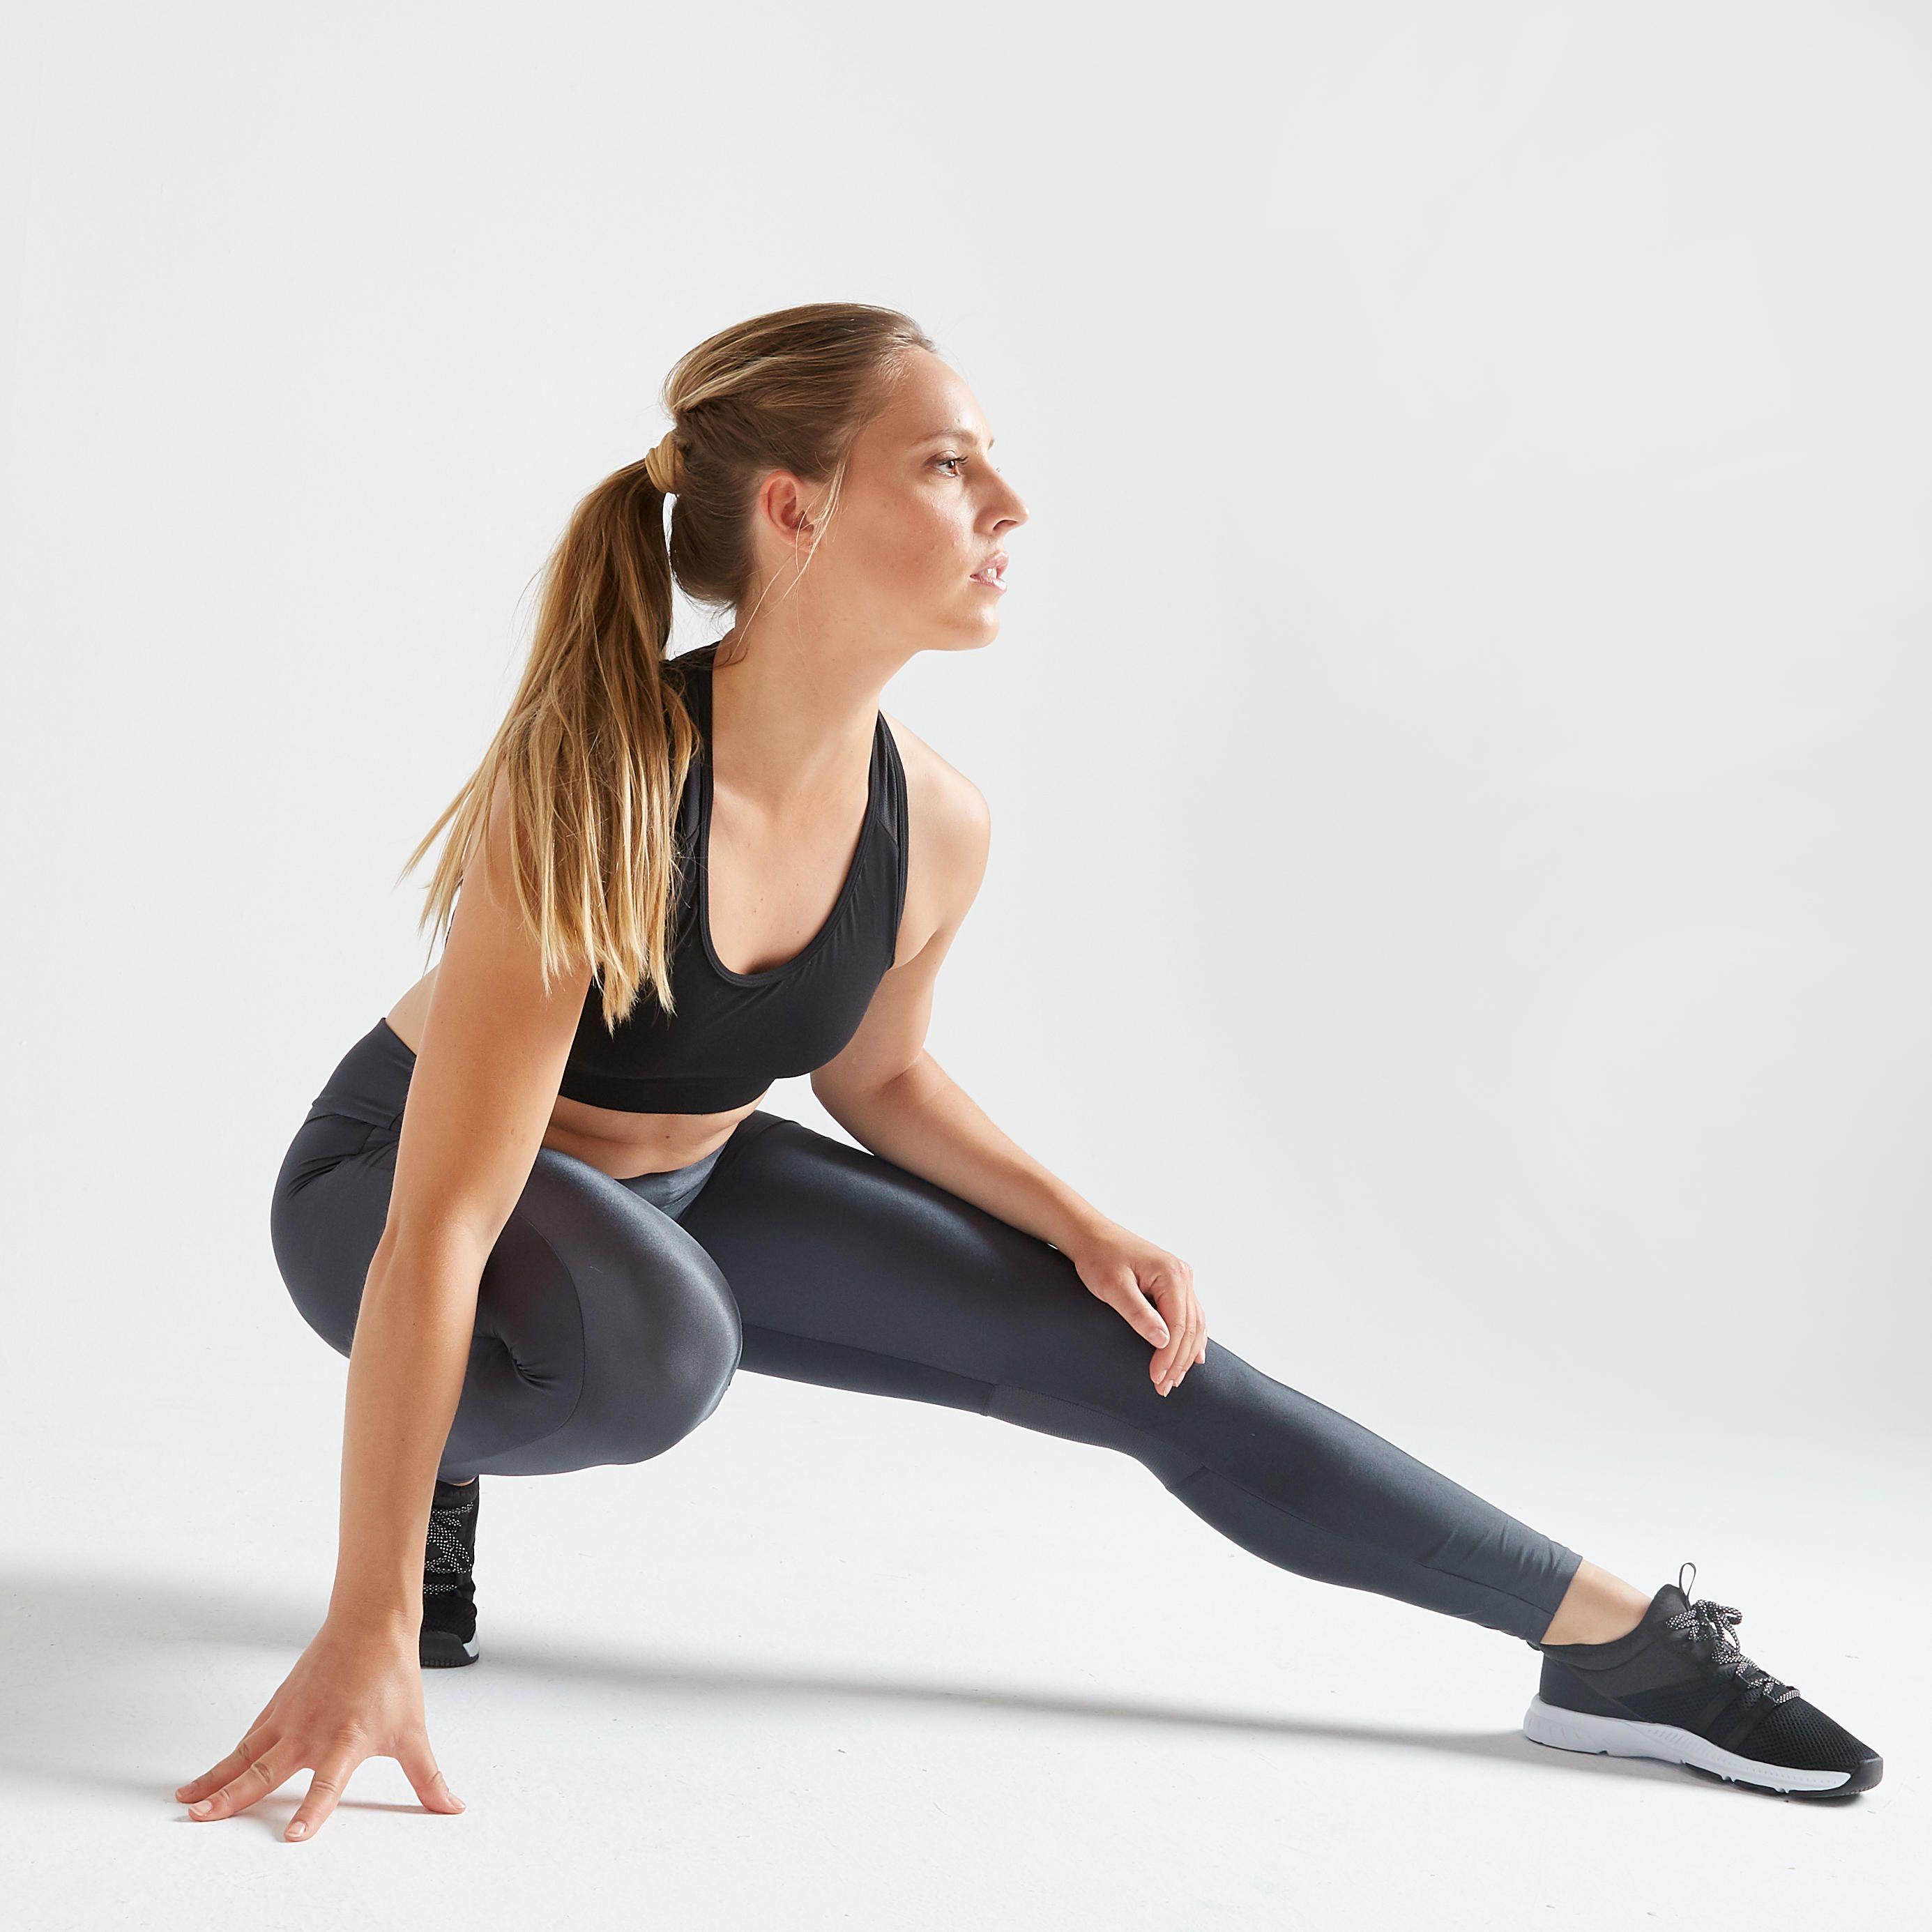 Decathlon Be Nl Decathlon Fr Magazine Q4 Nl Web Legging Fitness Cardiotraining Dames 120 Grijs 8543905